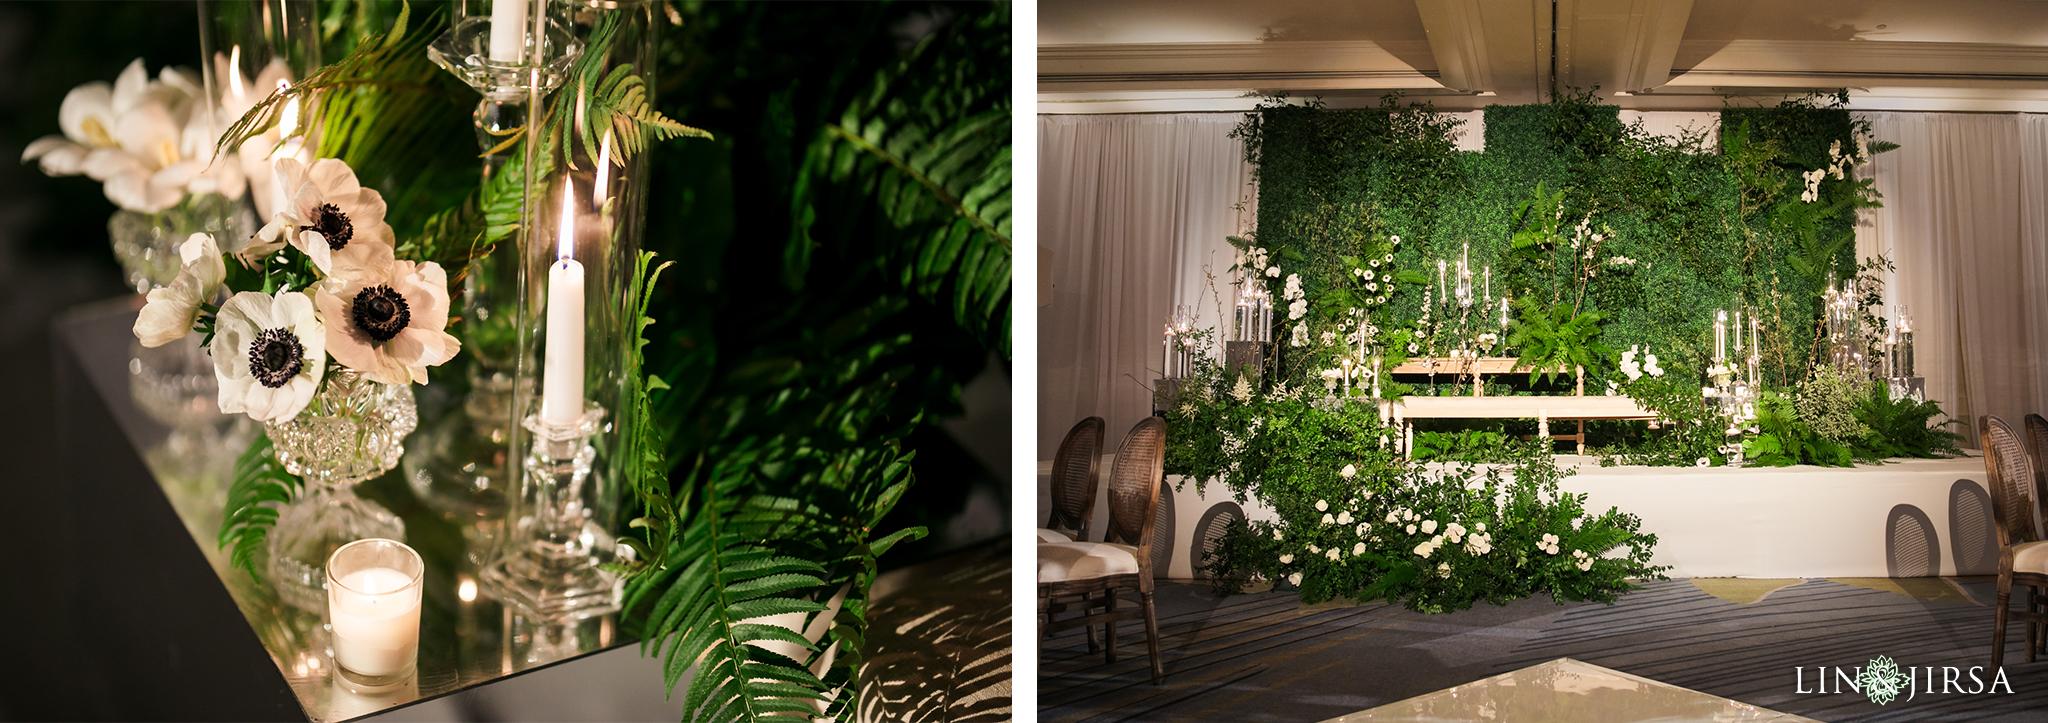 56 Ritz Carlton Laguna Niguel Indian Wedding Photography